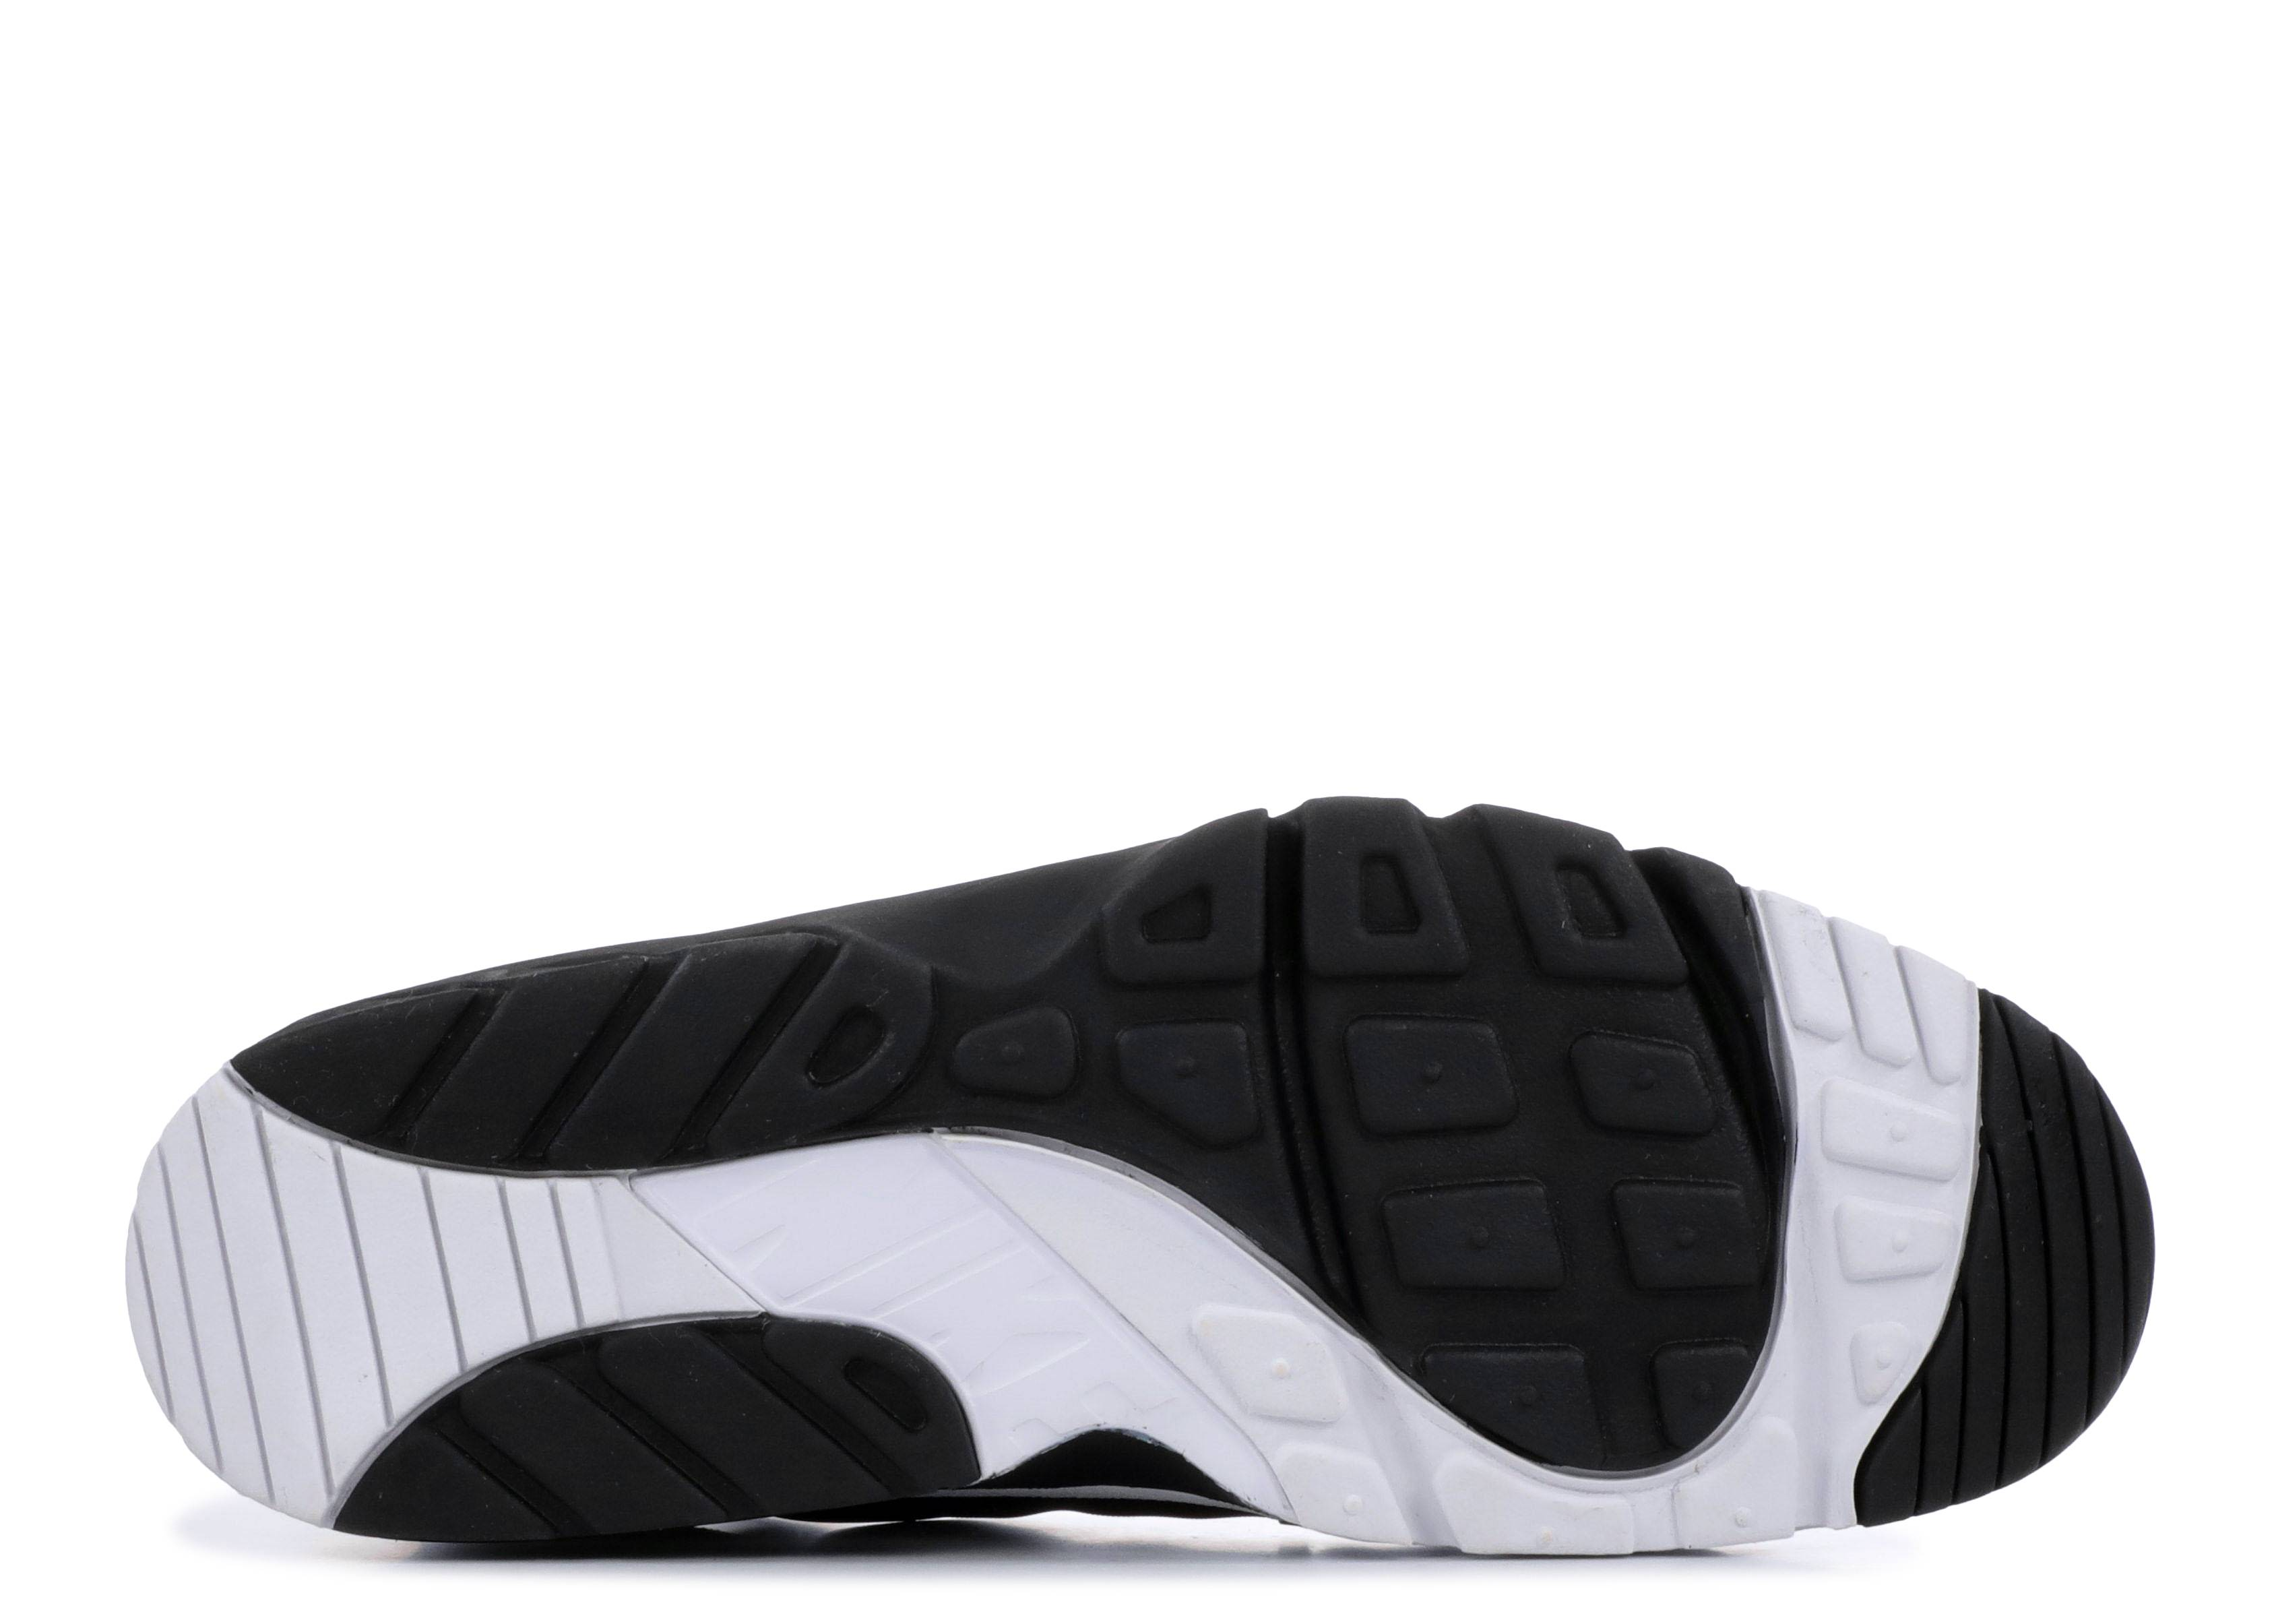 new styles e1c77 8c3de Nike Air Trainer Huarache - Nike - 679083 200 - medium olive black-jade  stn-white   Flight Club